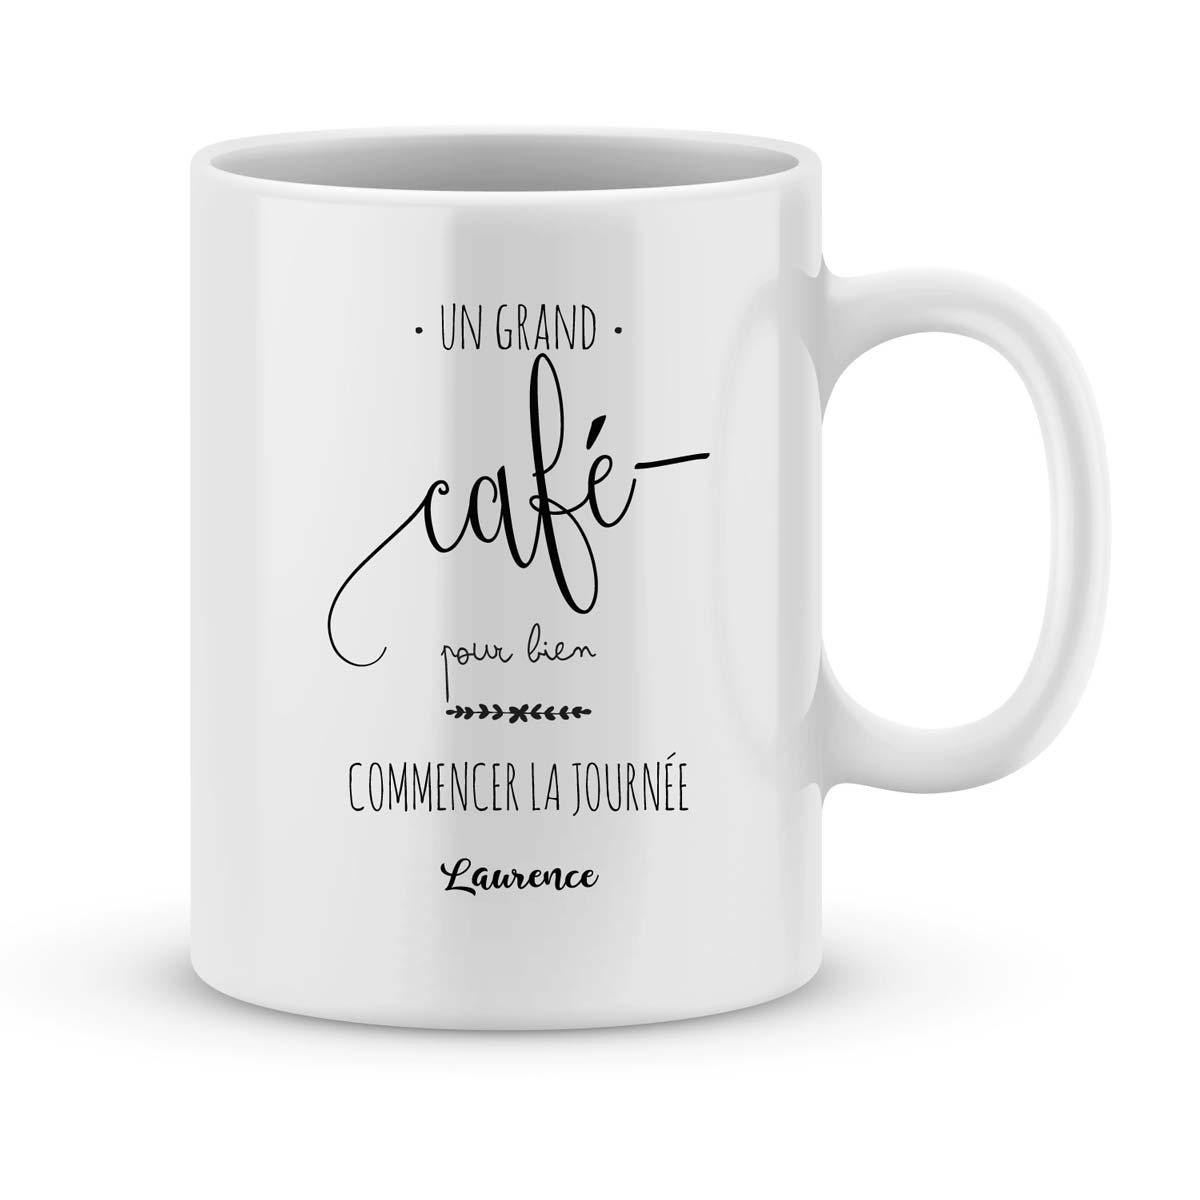 mug personnalise avec un prenom un grand cafe